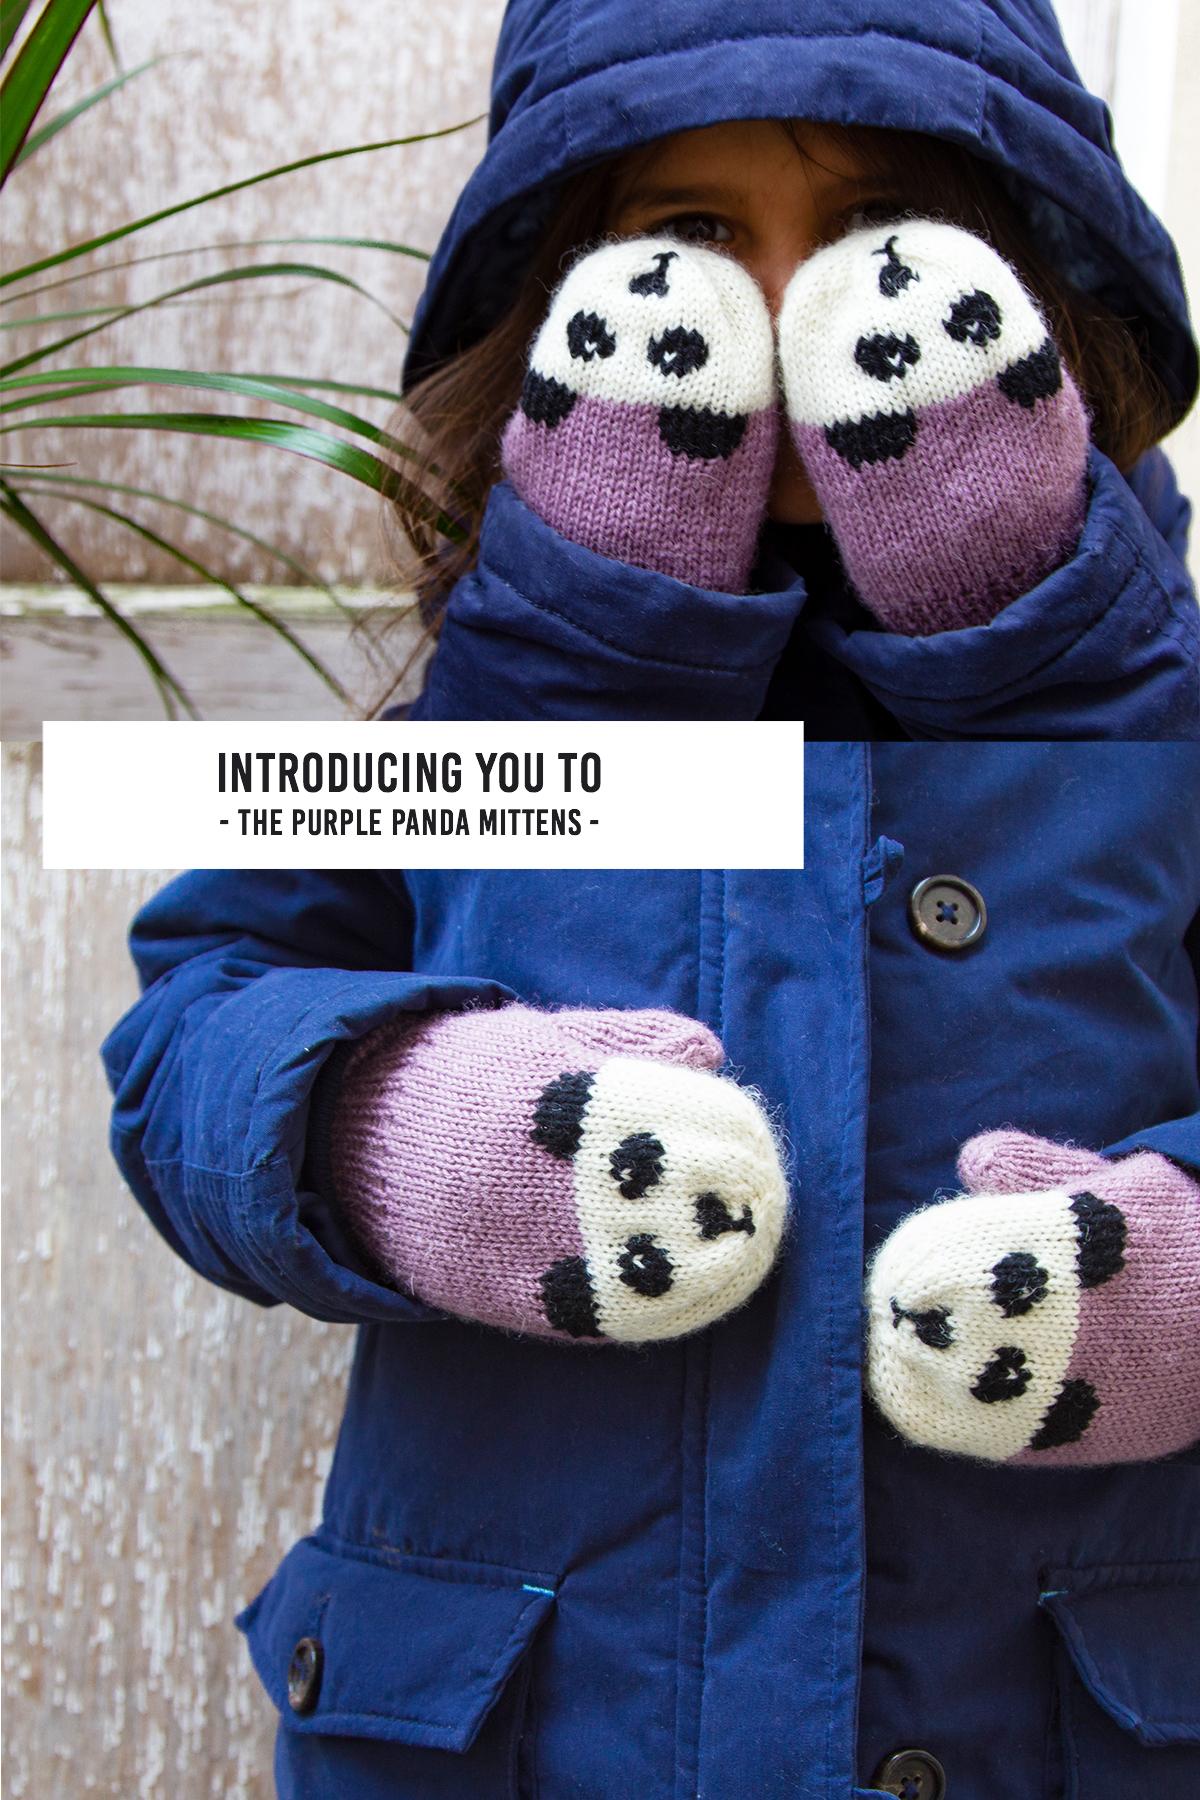 purple panda mittens 1.jpg